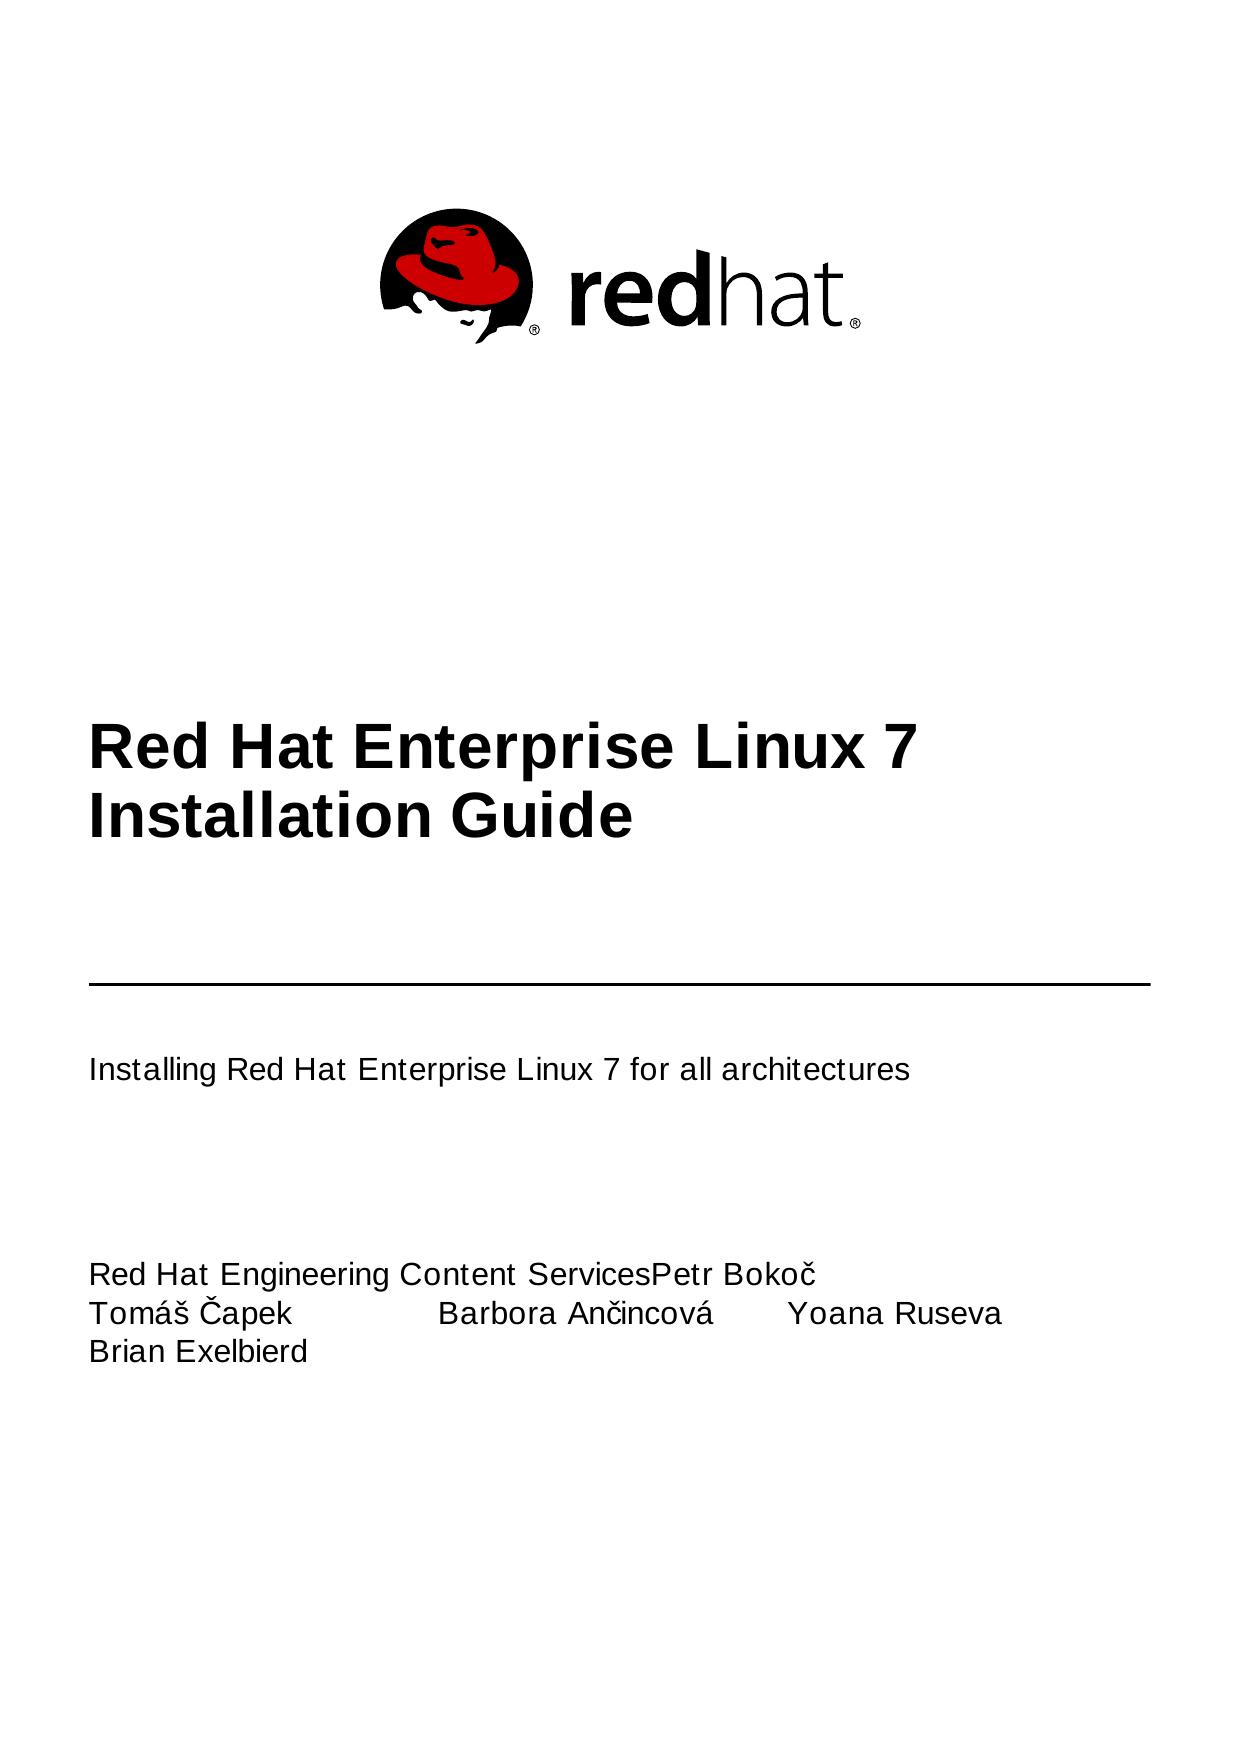 Red Hat Enterprise Linux 7 Installation Guide   manualzz com